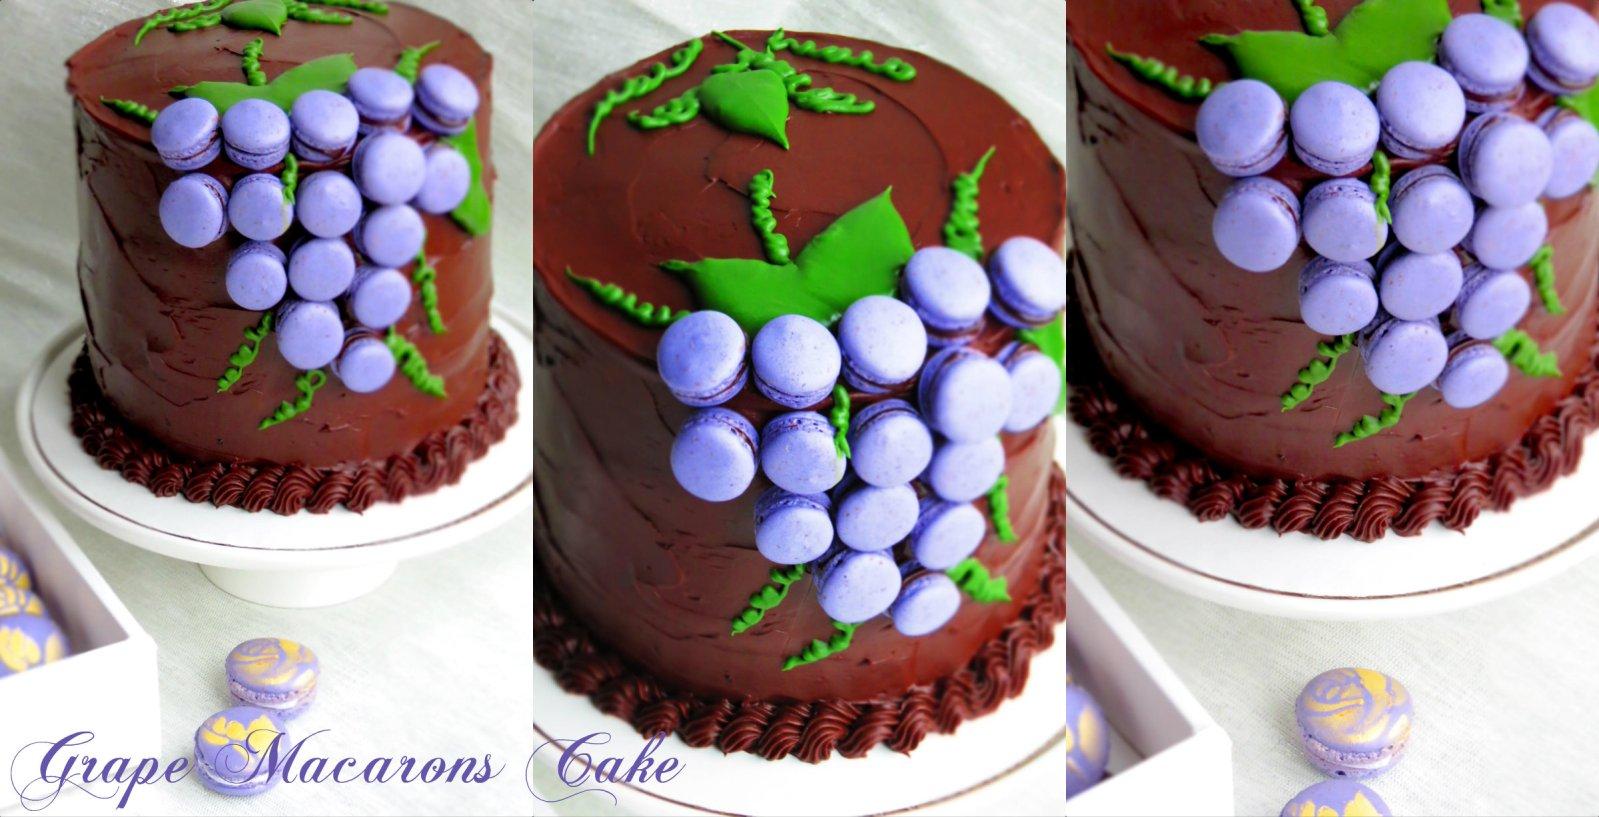 Grape-Macarons-Cake-2